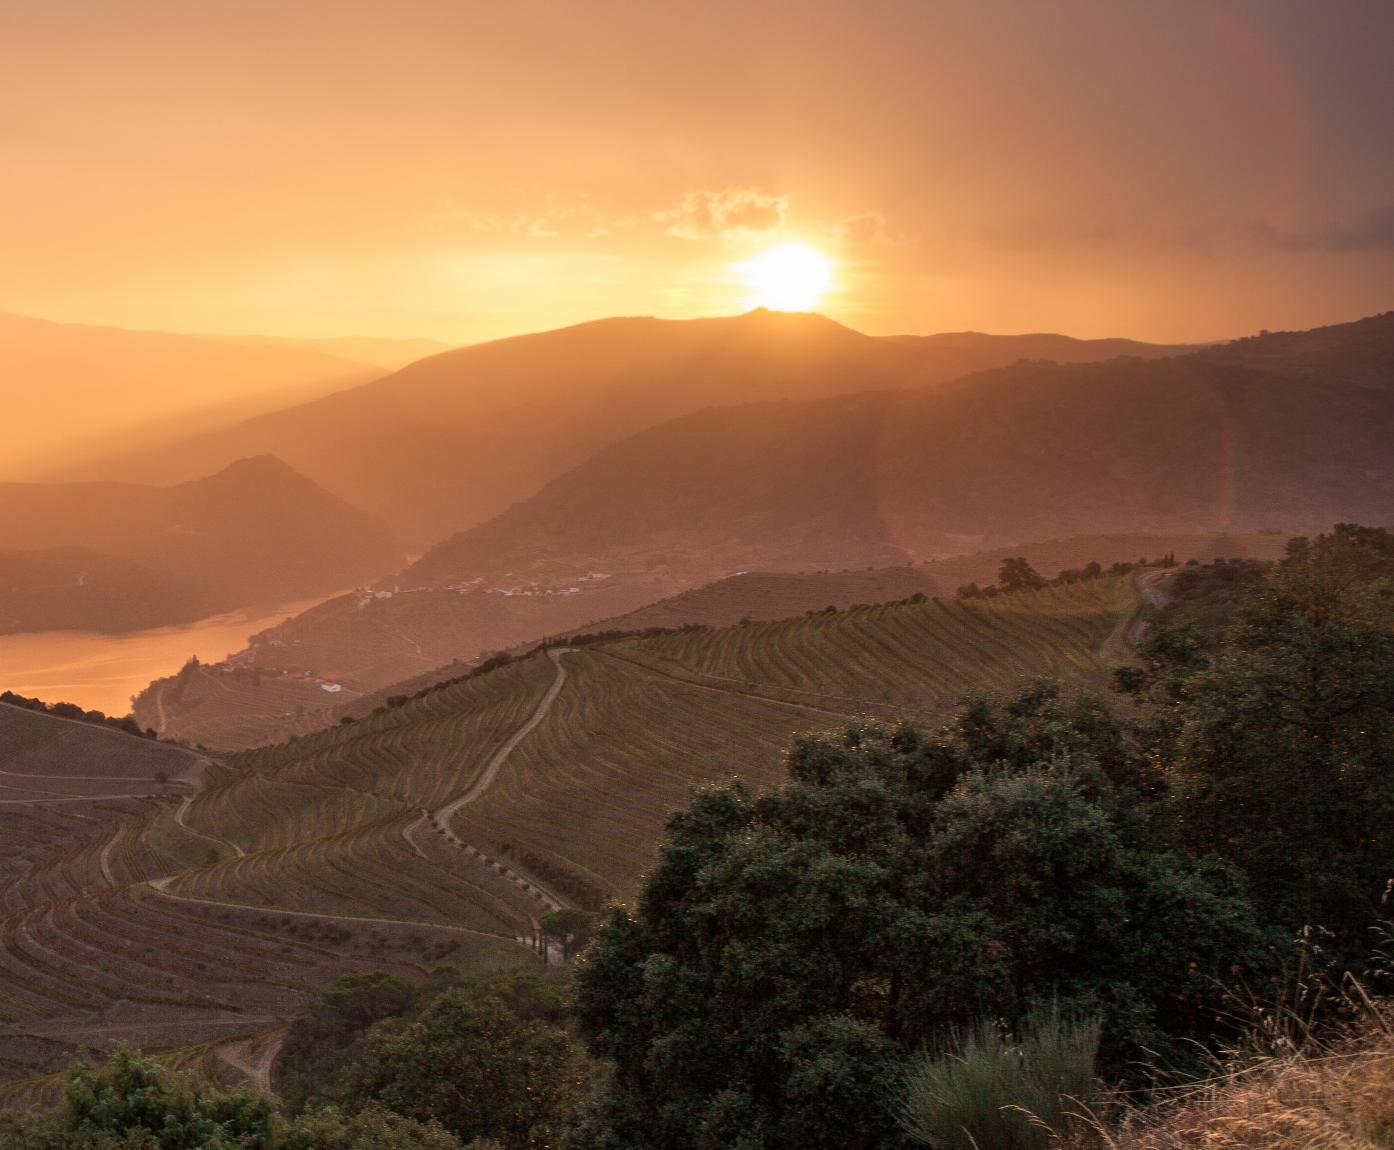 Douro Valley #valedaveiga #valedaveigadouro #vinho #vino #wine #winelovers #winetime #instawine #douro #douroriver #riodouro #vineyard #dourovalley #valedodouro #portuguesewines #vinhosdeportugal #winepassion #instawine #dourowines #dourowine